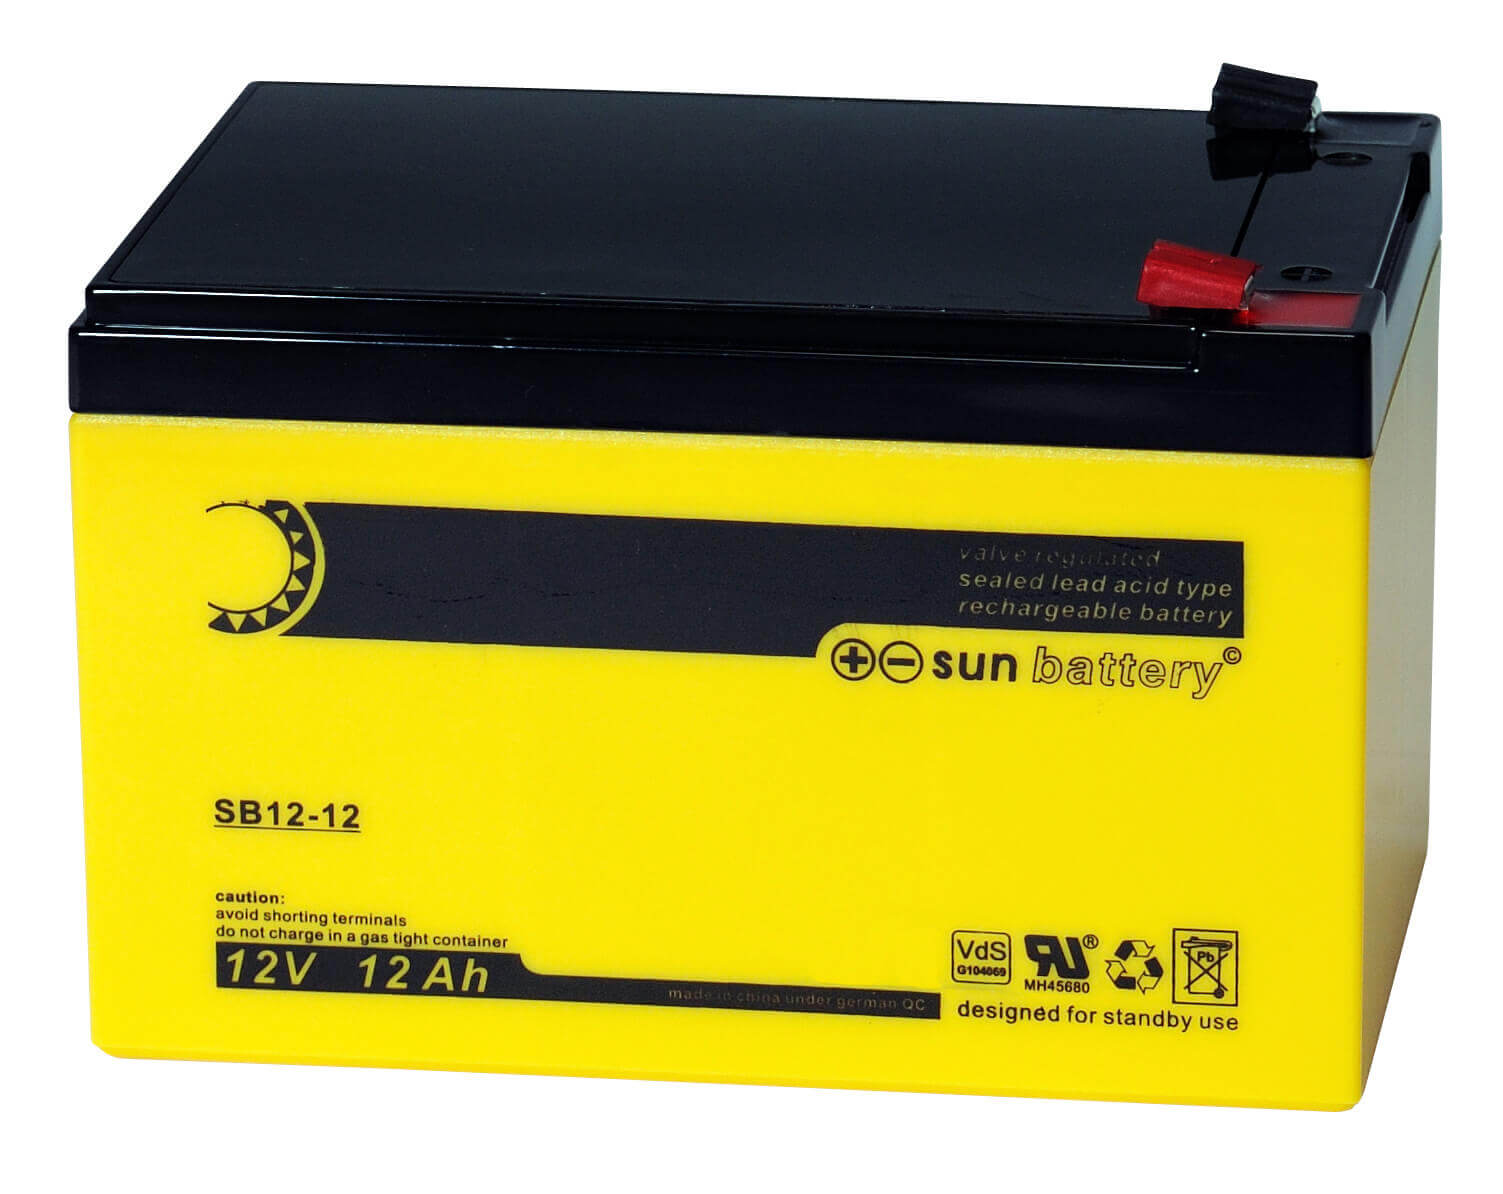 Sun Battery SB12-12 12V 12Ah Bleiakku Faston 187 Anschluss